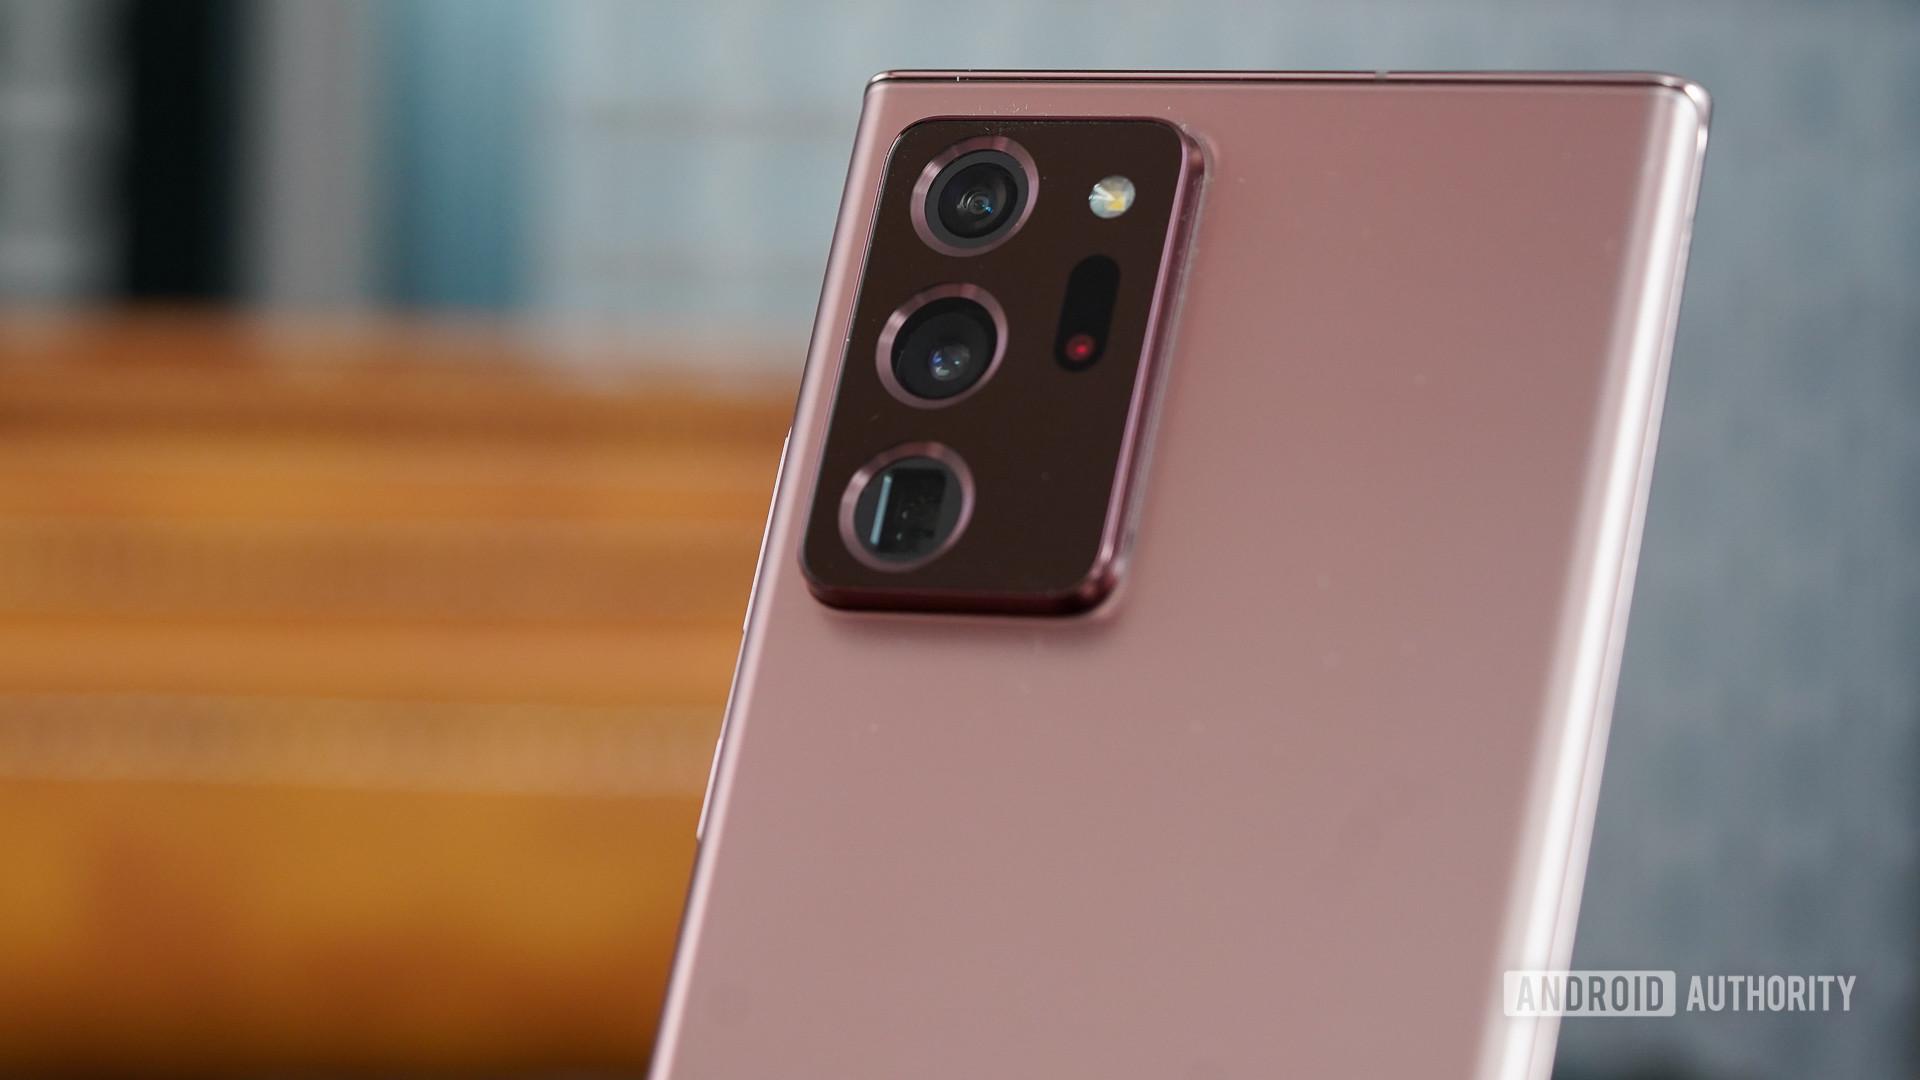 Samsung Galaxy Note 20 Ultra camera closeup